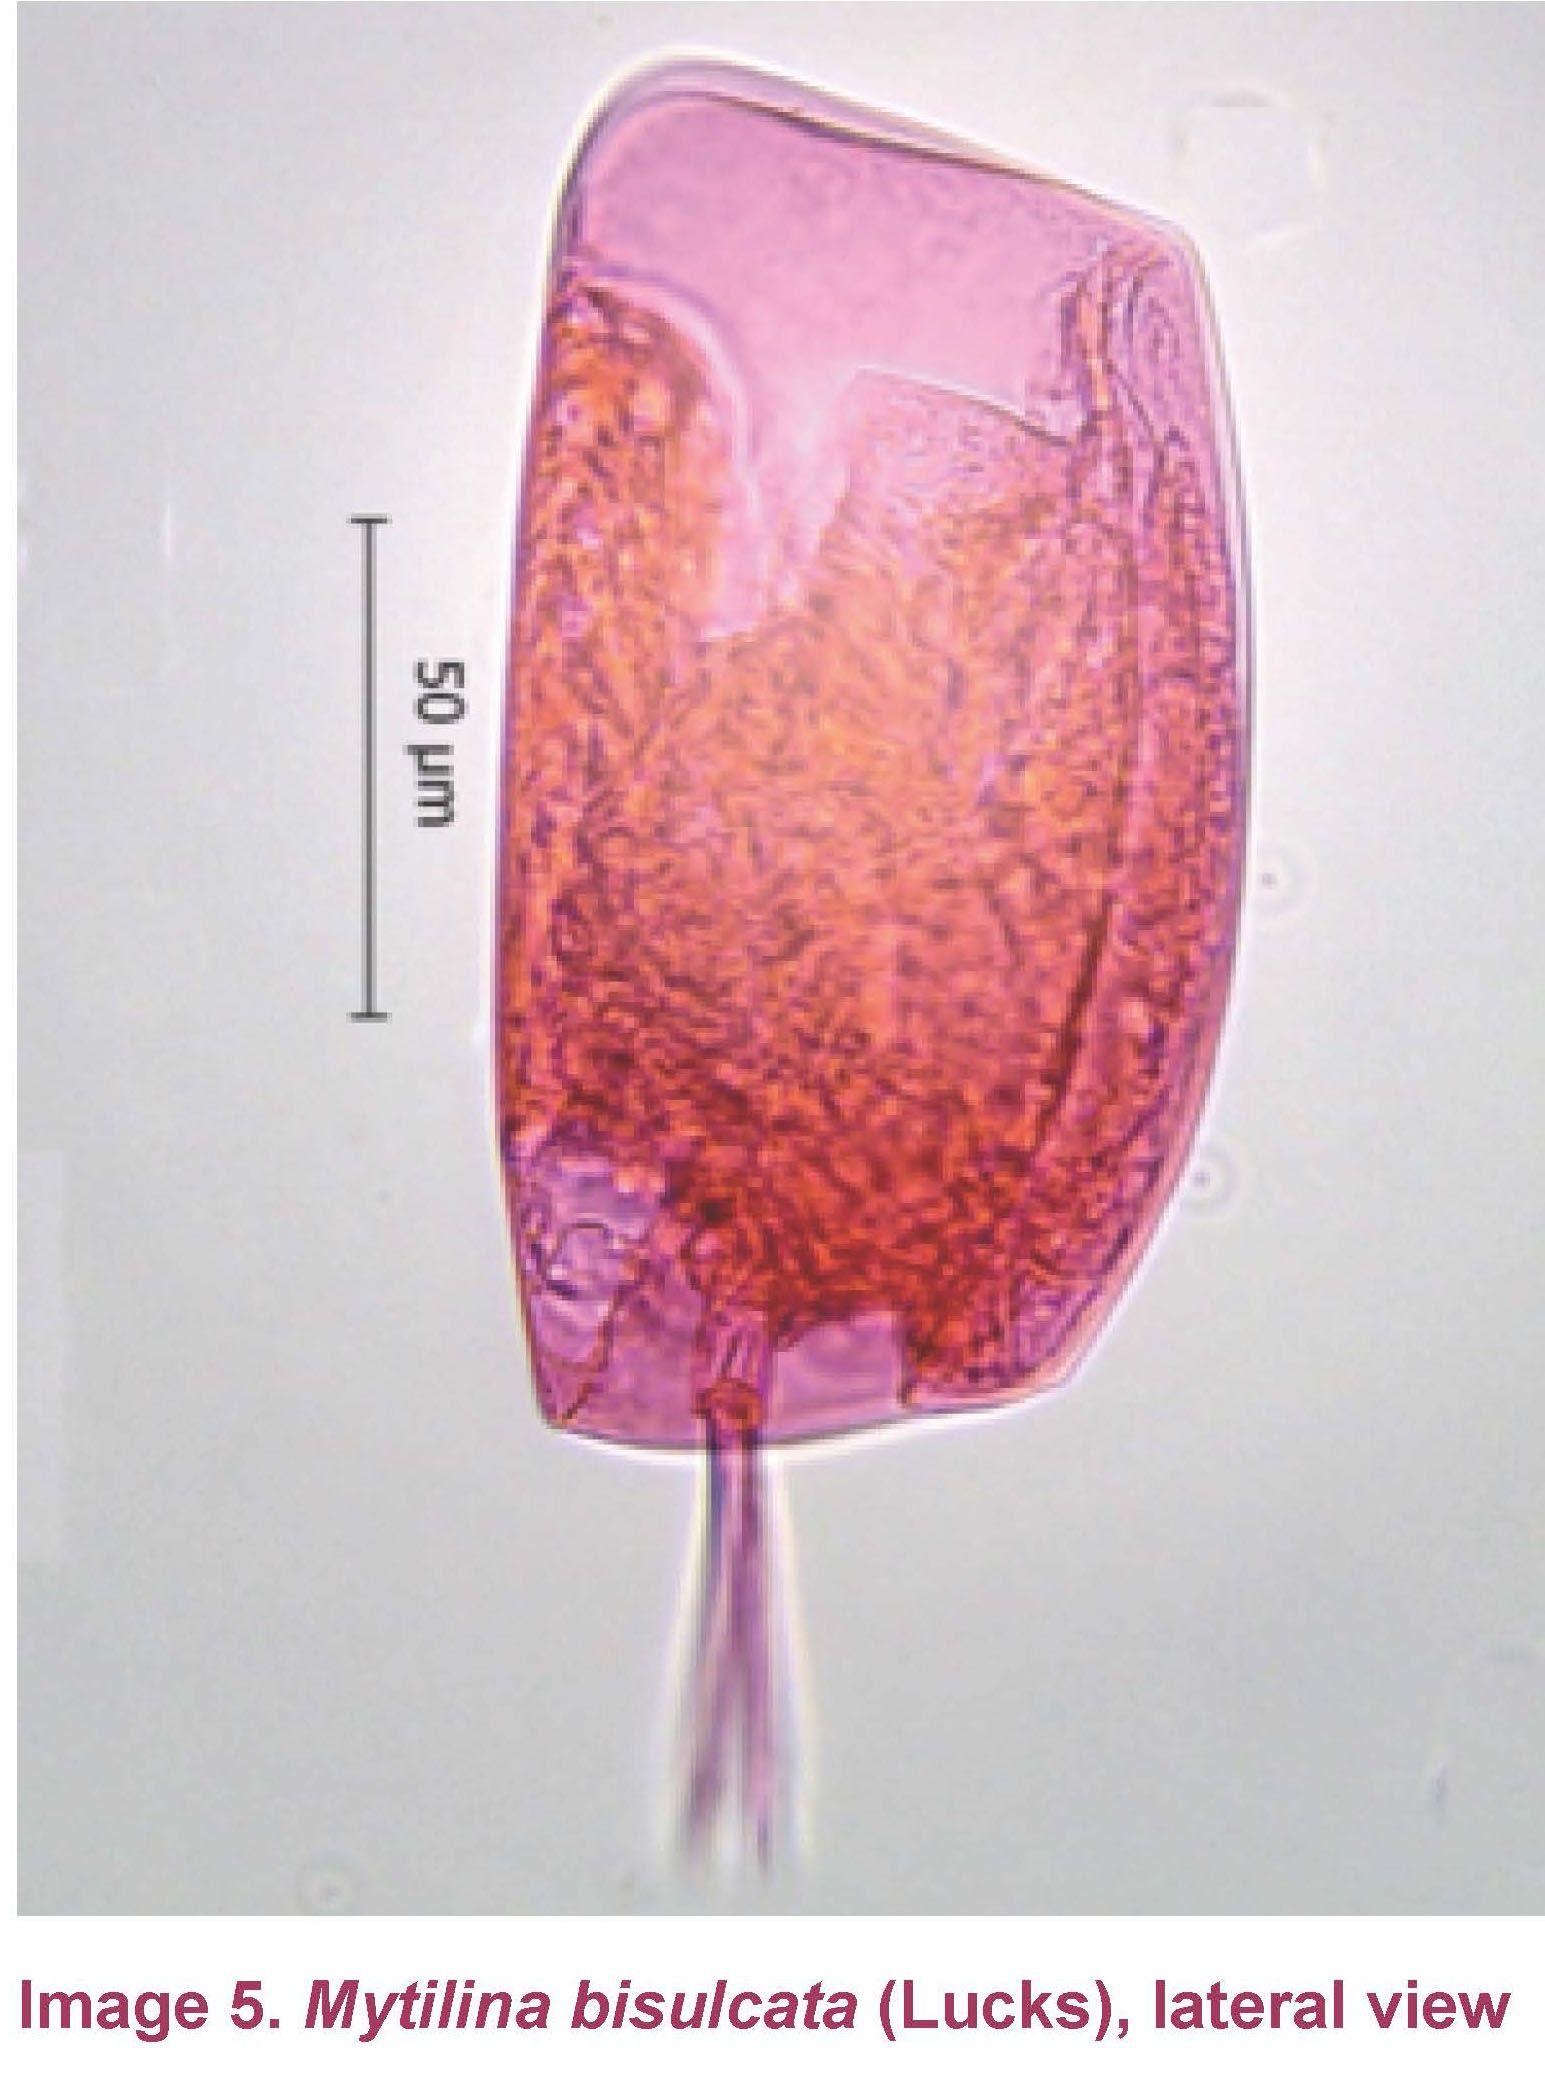 Mytilina bisulcata lucks 1912